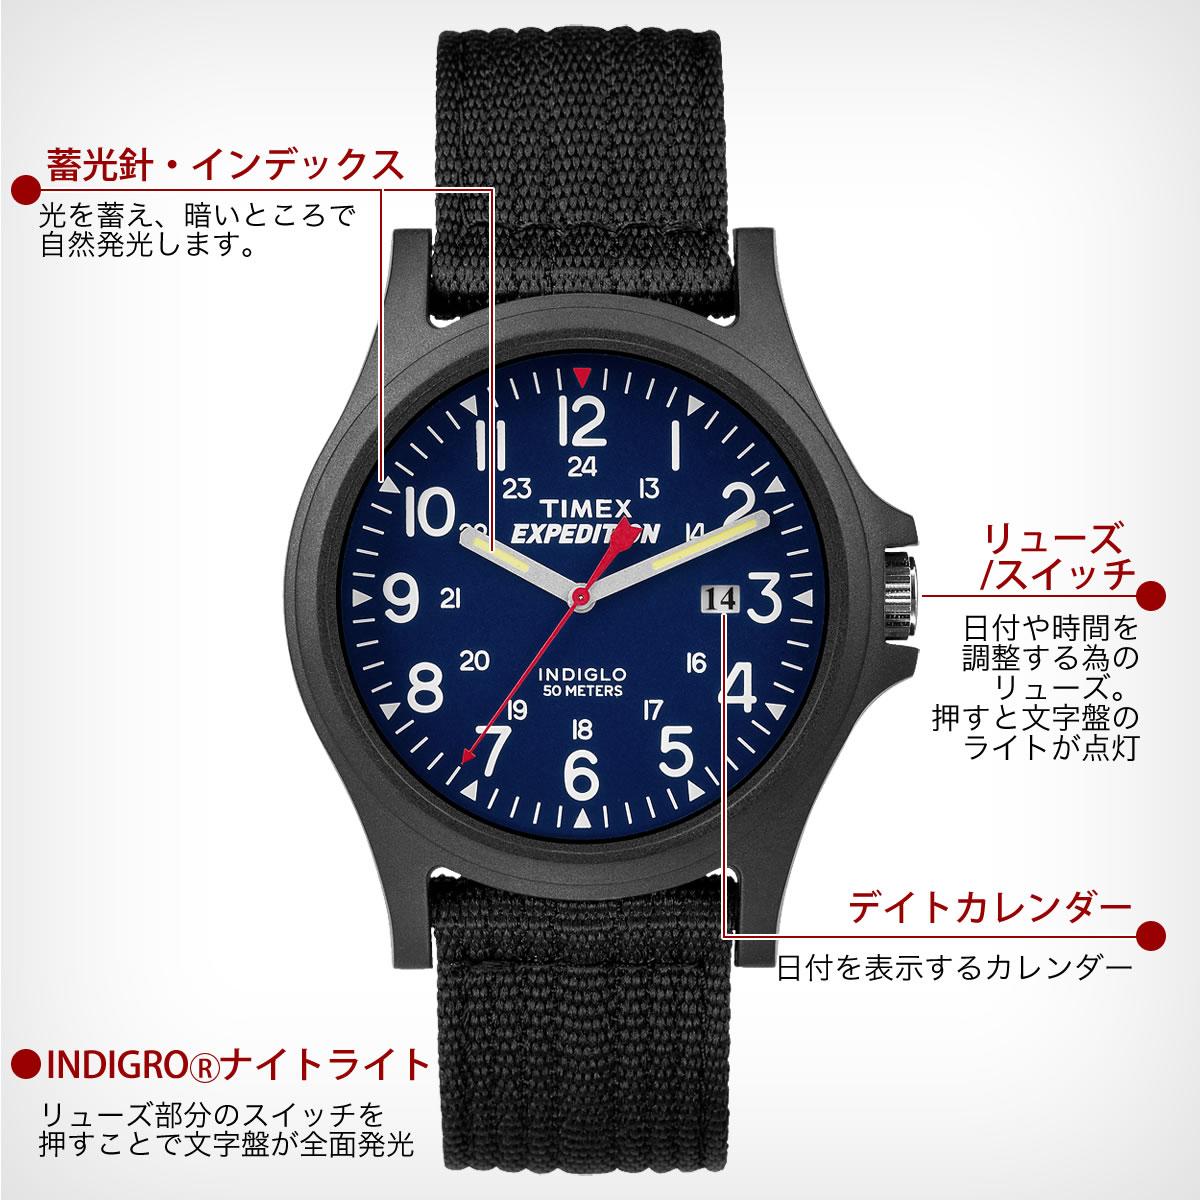 TIMEX Expedition  ACADIA ネイビー×ブラック 41mm TW4999900 機能詳細